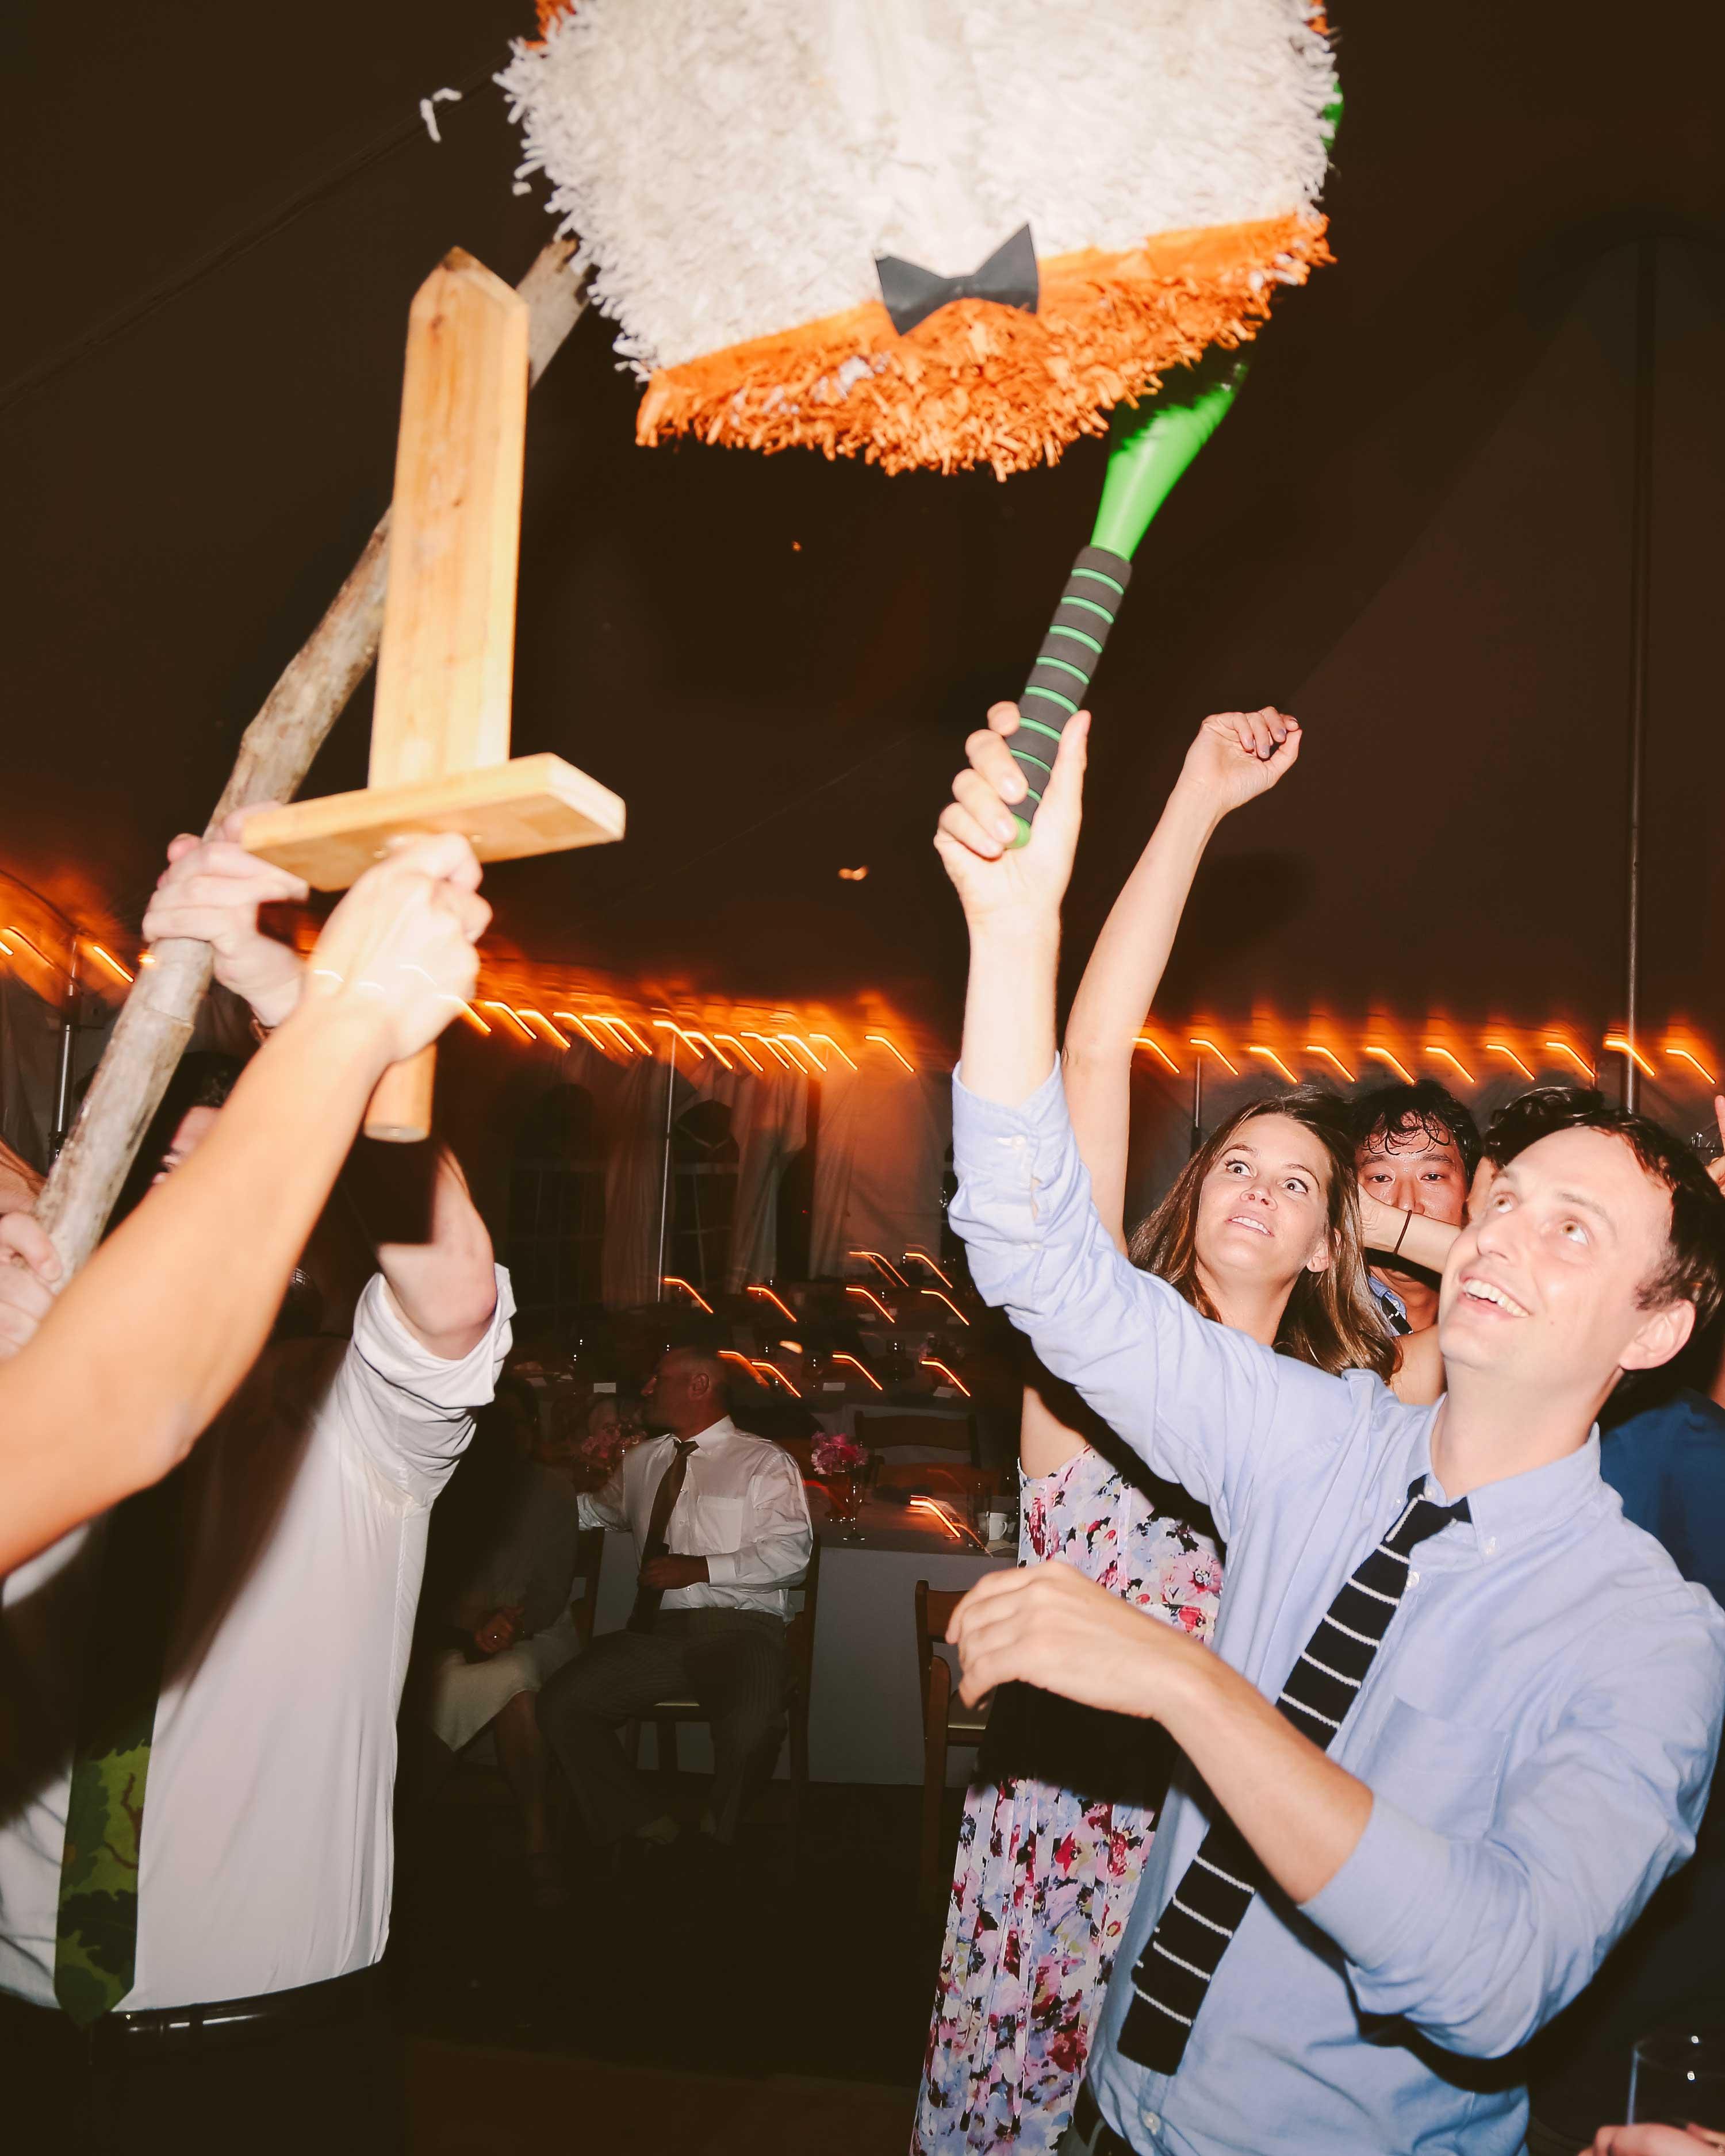 alisa-barrett-wedding-pinata-902-s113048-0716.jpg